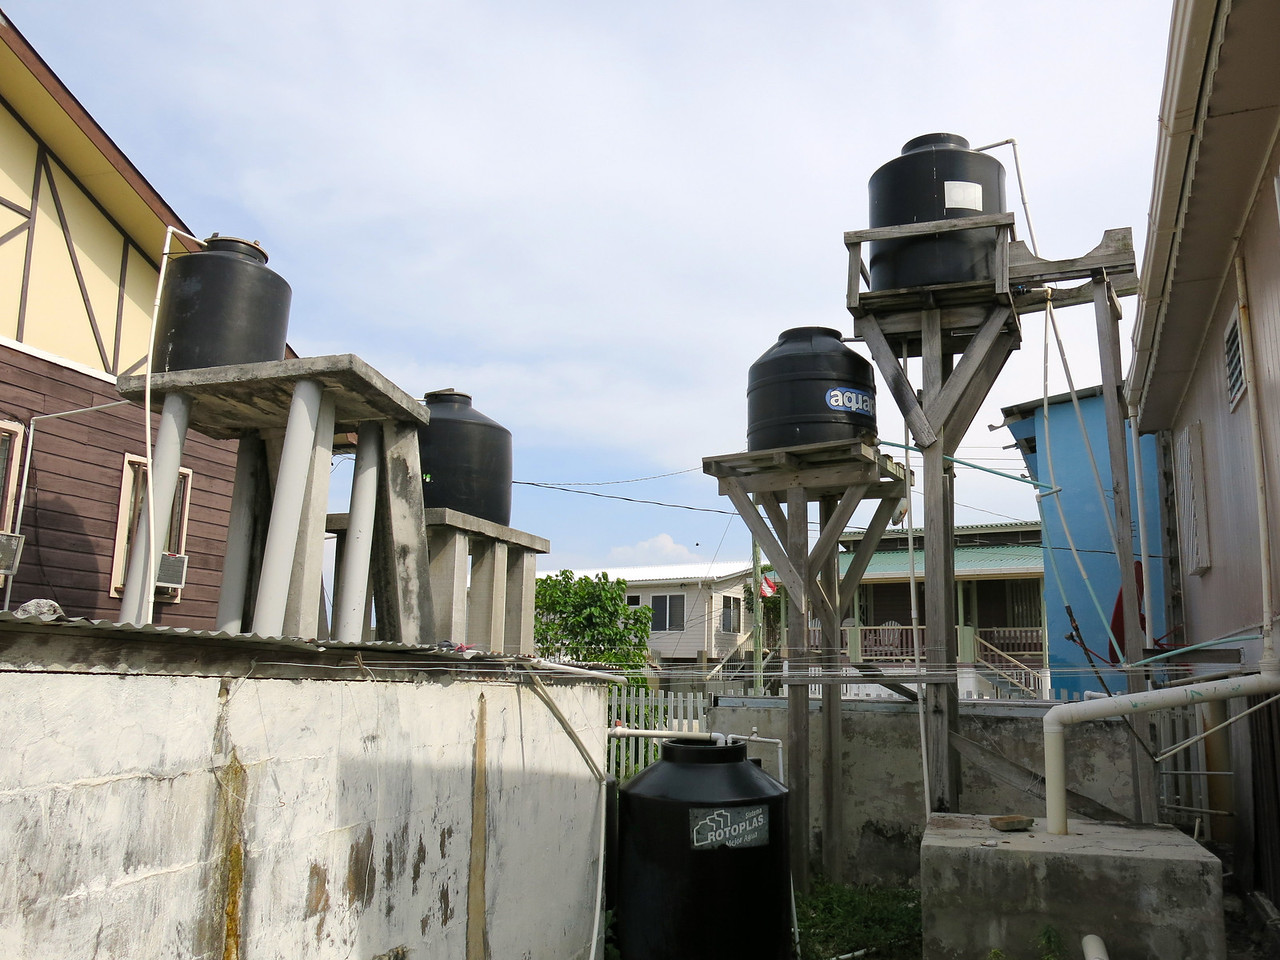 Water Supply-Utila Cays